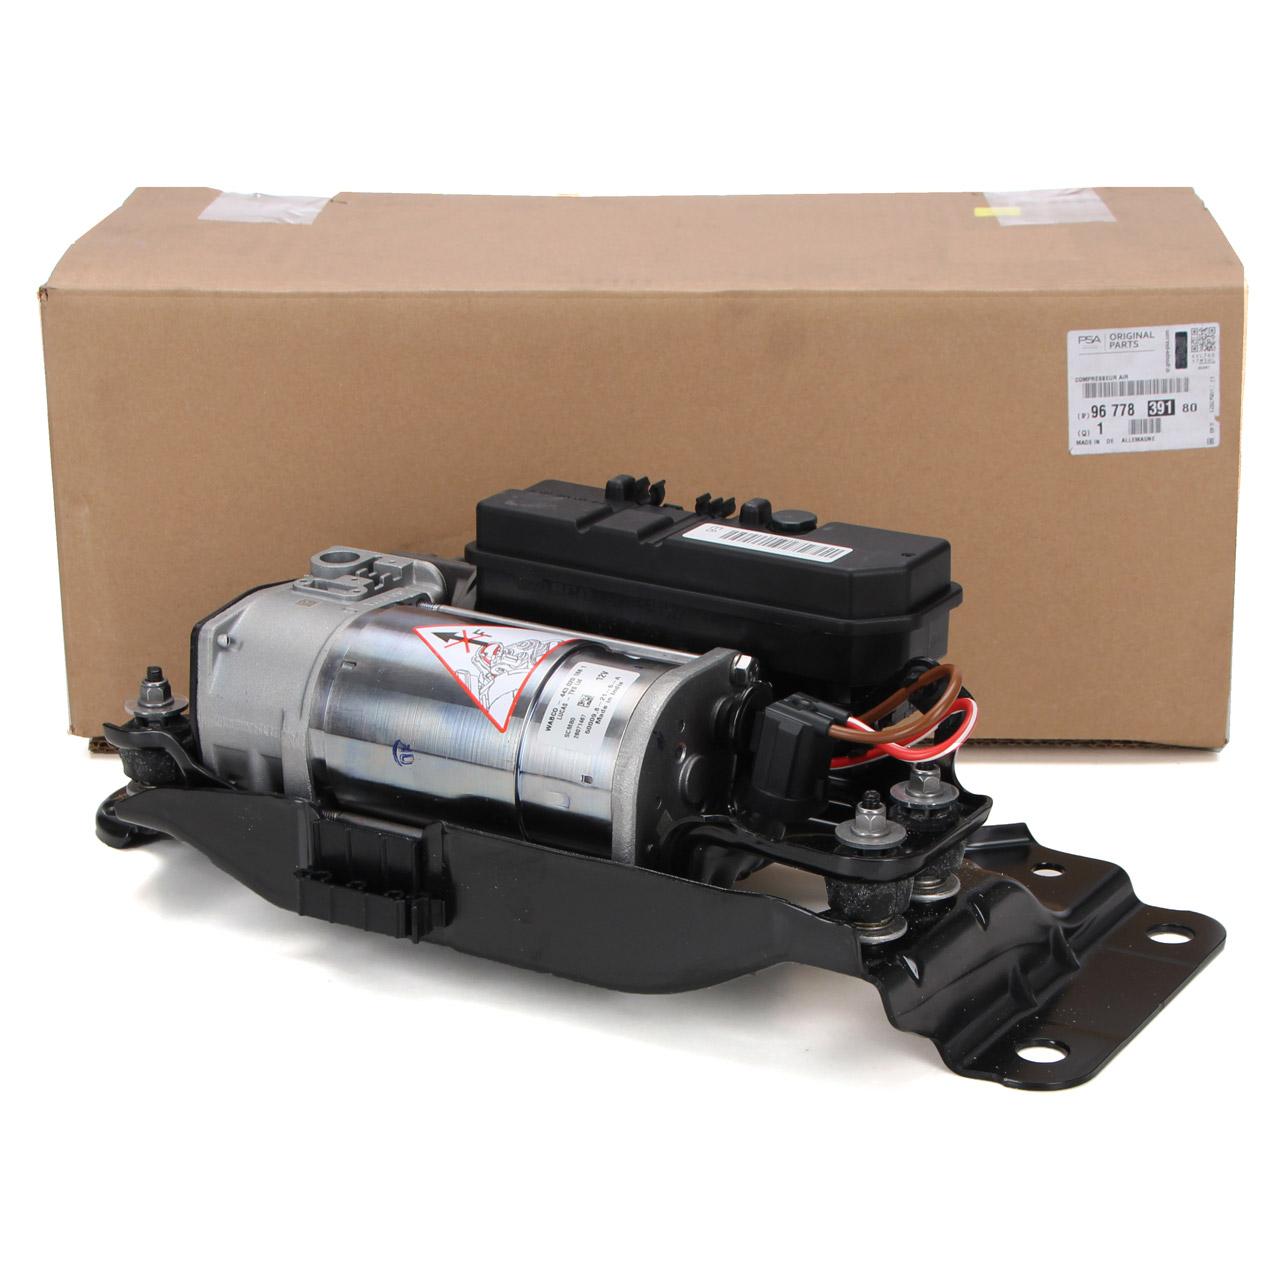 ORIGINAL PSA Kompressor Luftfederung Luftkompressor Jumpy Expert 9677839180